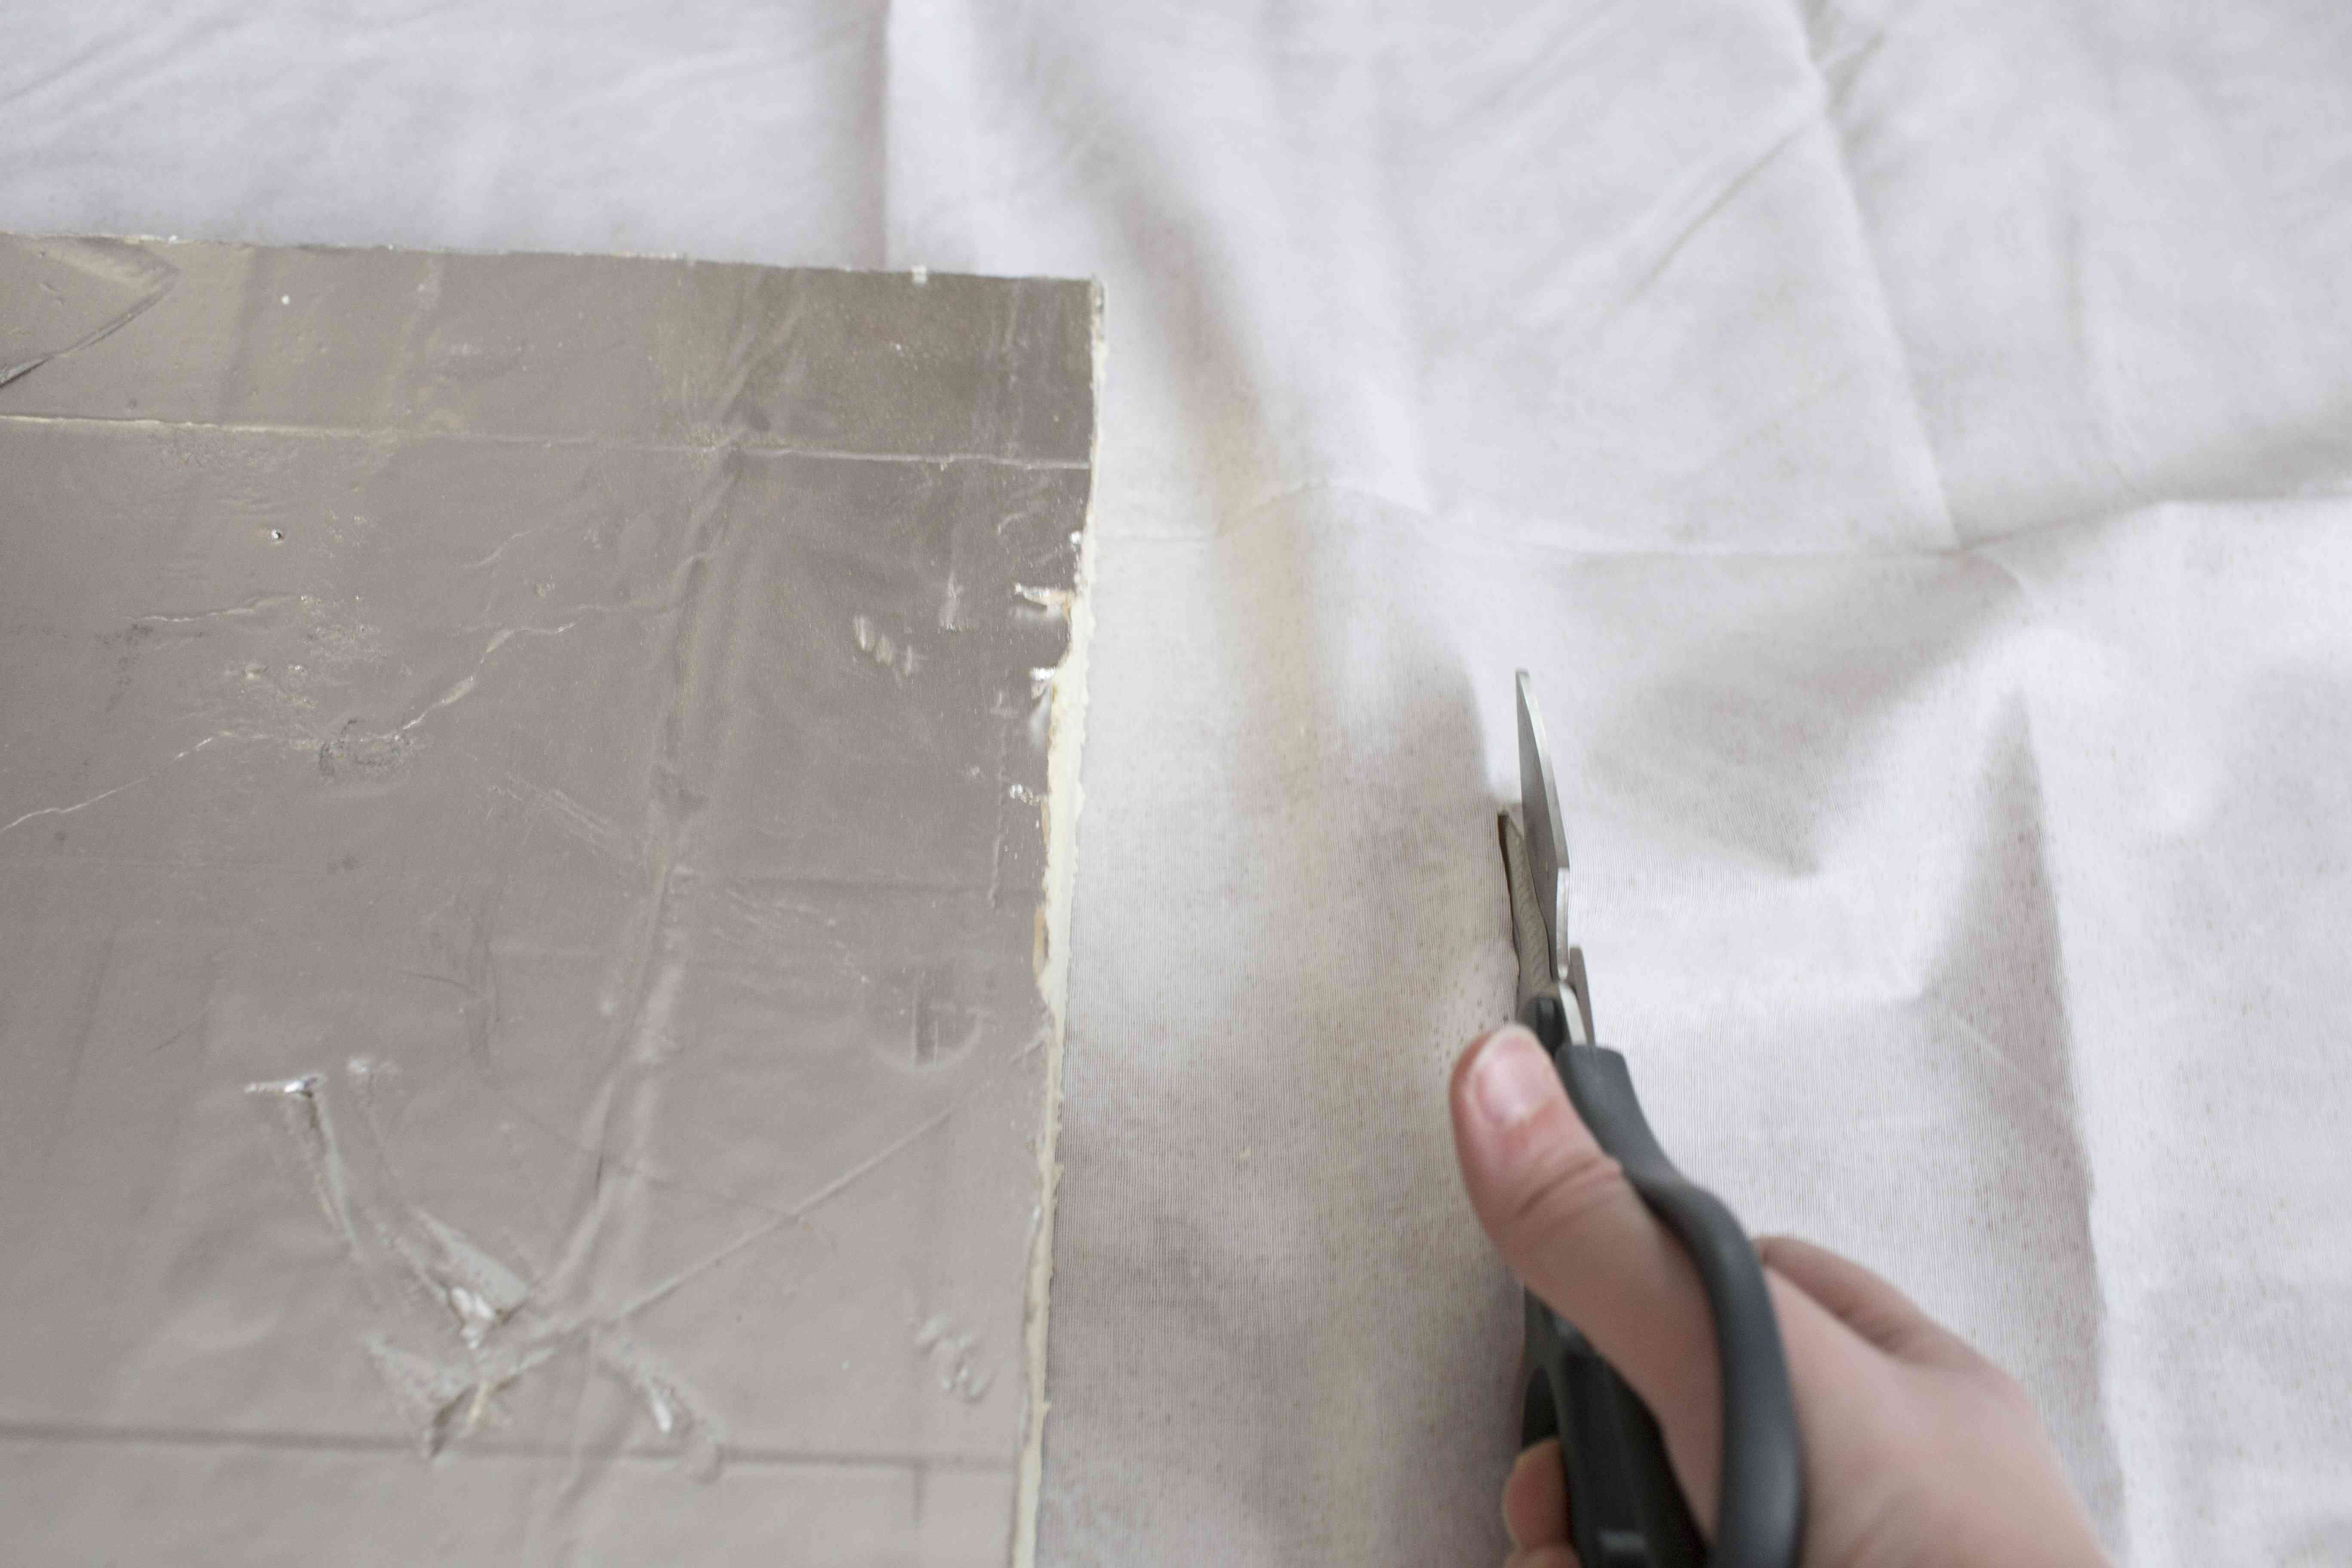 Hand cutting fabric